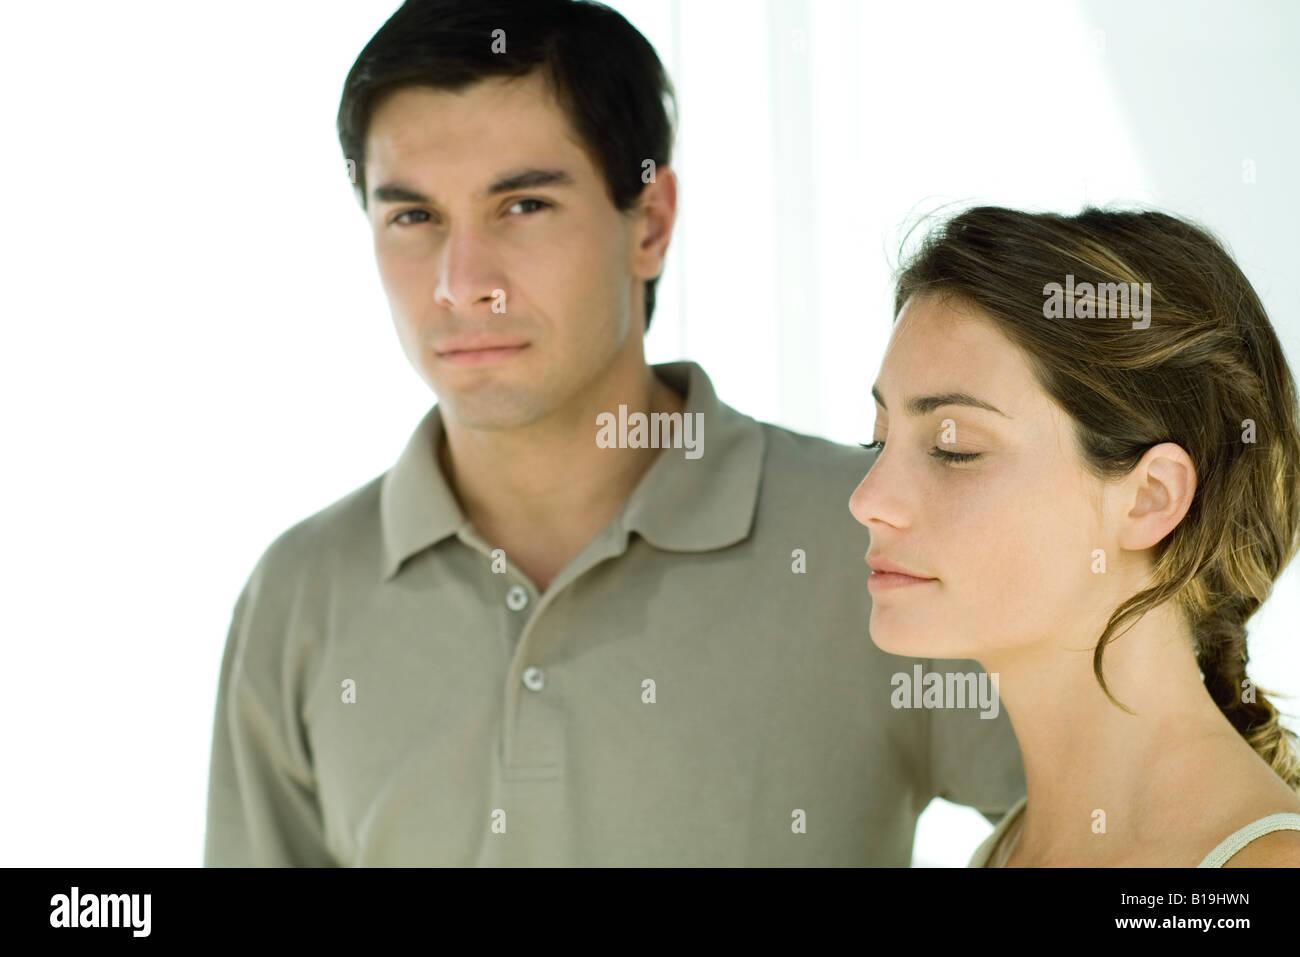 Jeune couple, man looking at camera, woman looking away Banque D'Images